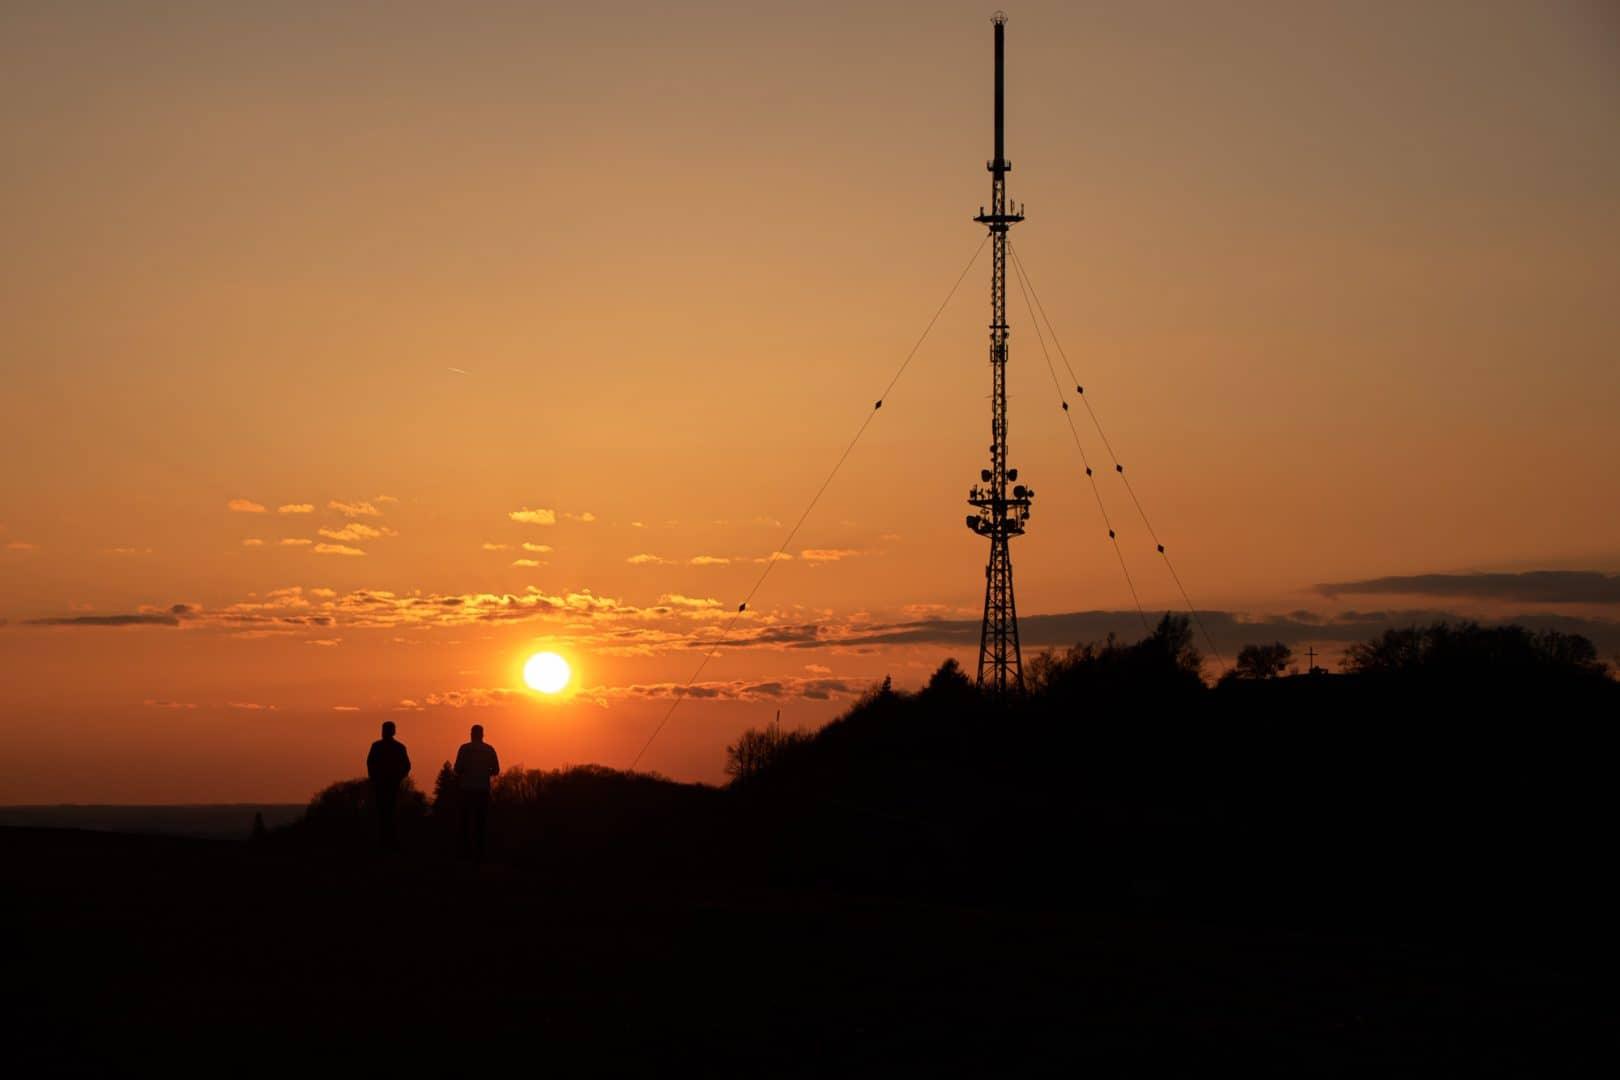 Sonnenuntergang am Hesselberg - von Andrea Seiss